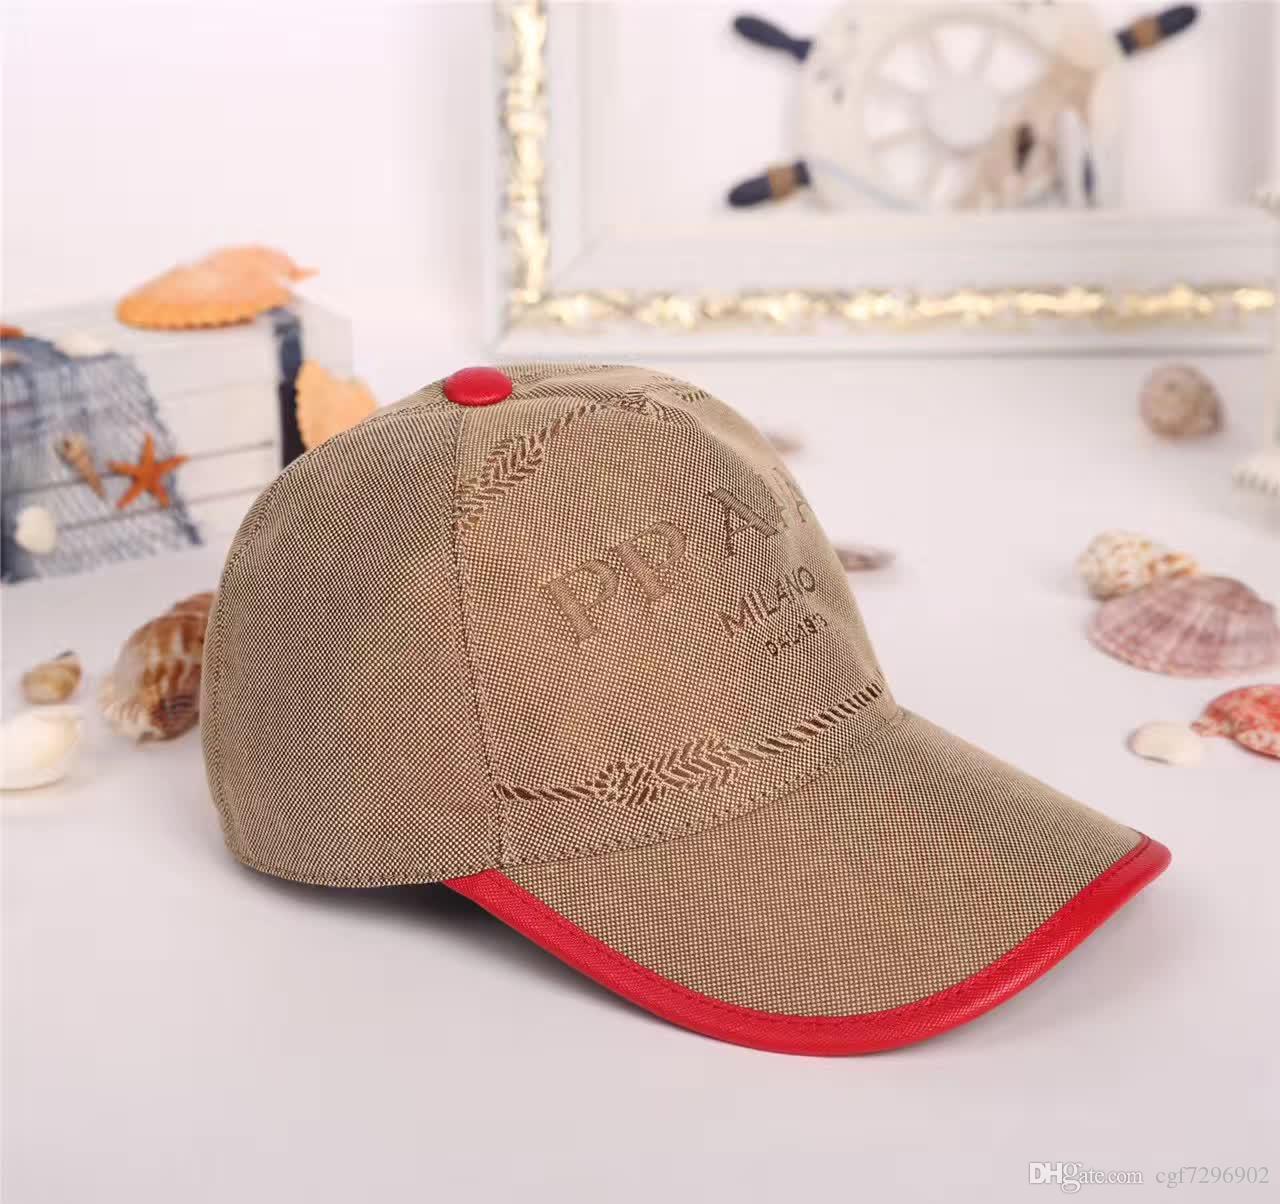 High End Luxury Brand Hats Fashion Designer Duck Tongue ...